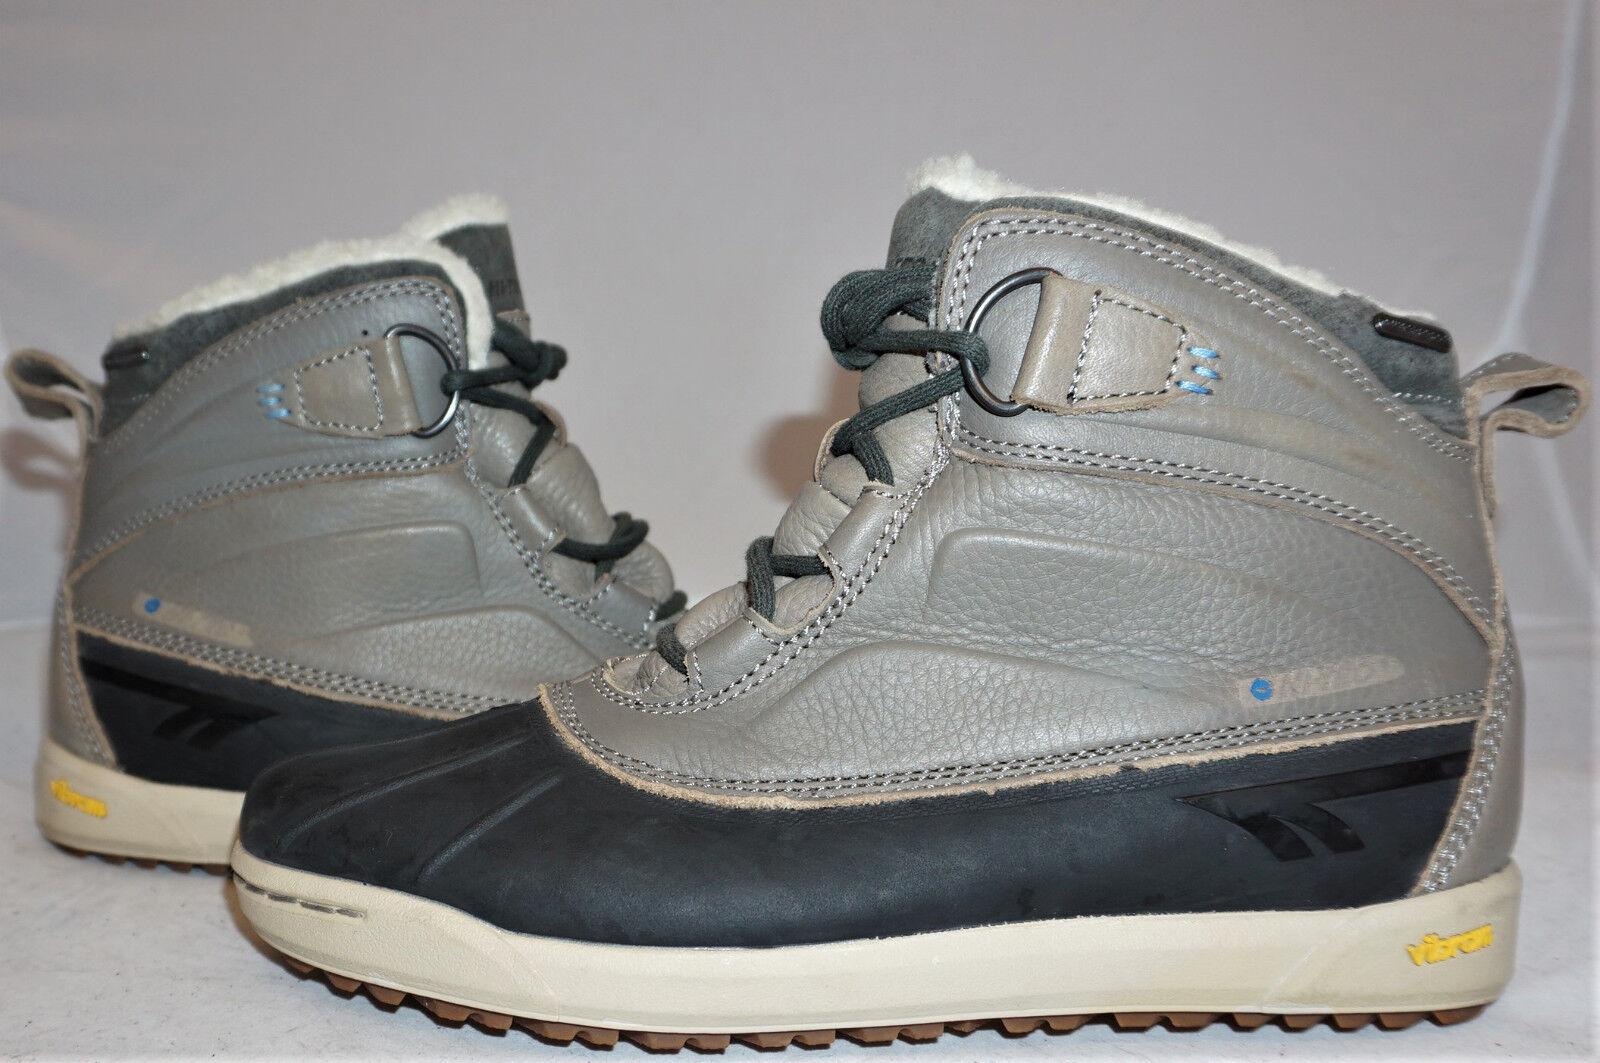 Hi-Tec Sierra Duck 41 WP UK 7 EU 41 Duck US 8 Winterschuhe Stiefel NEU  #2669 785298